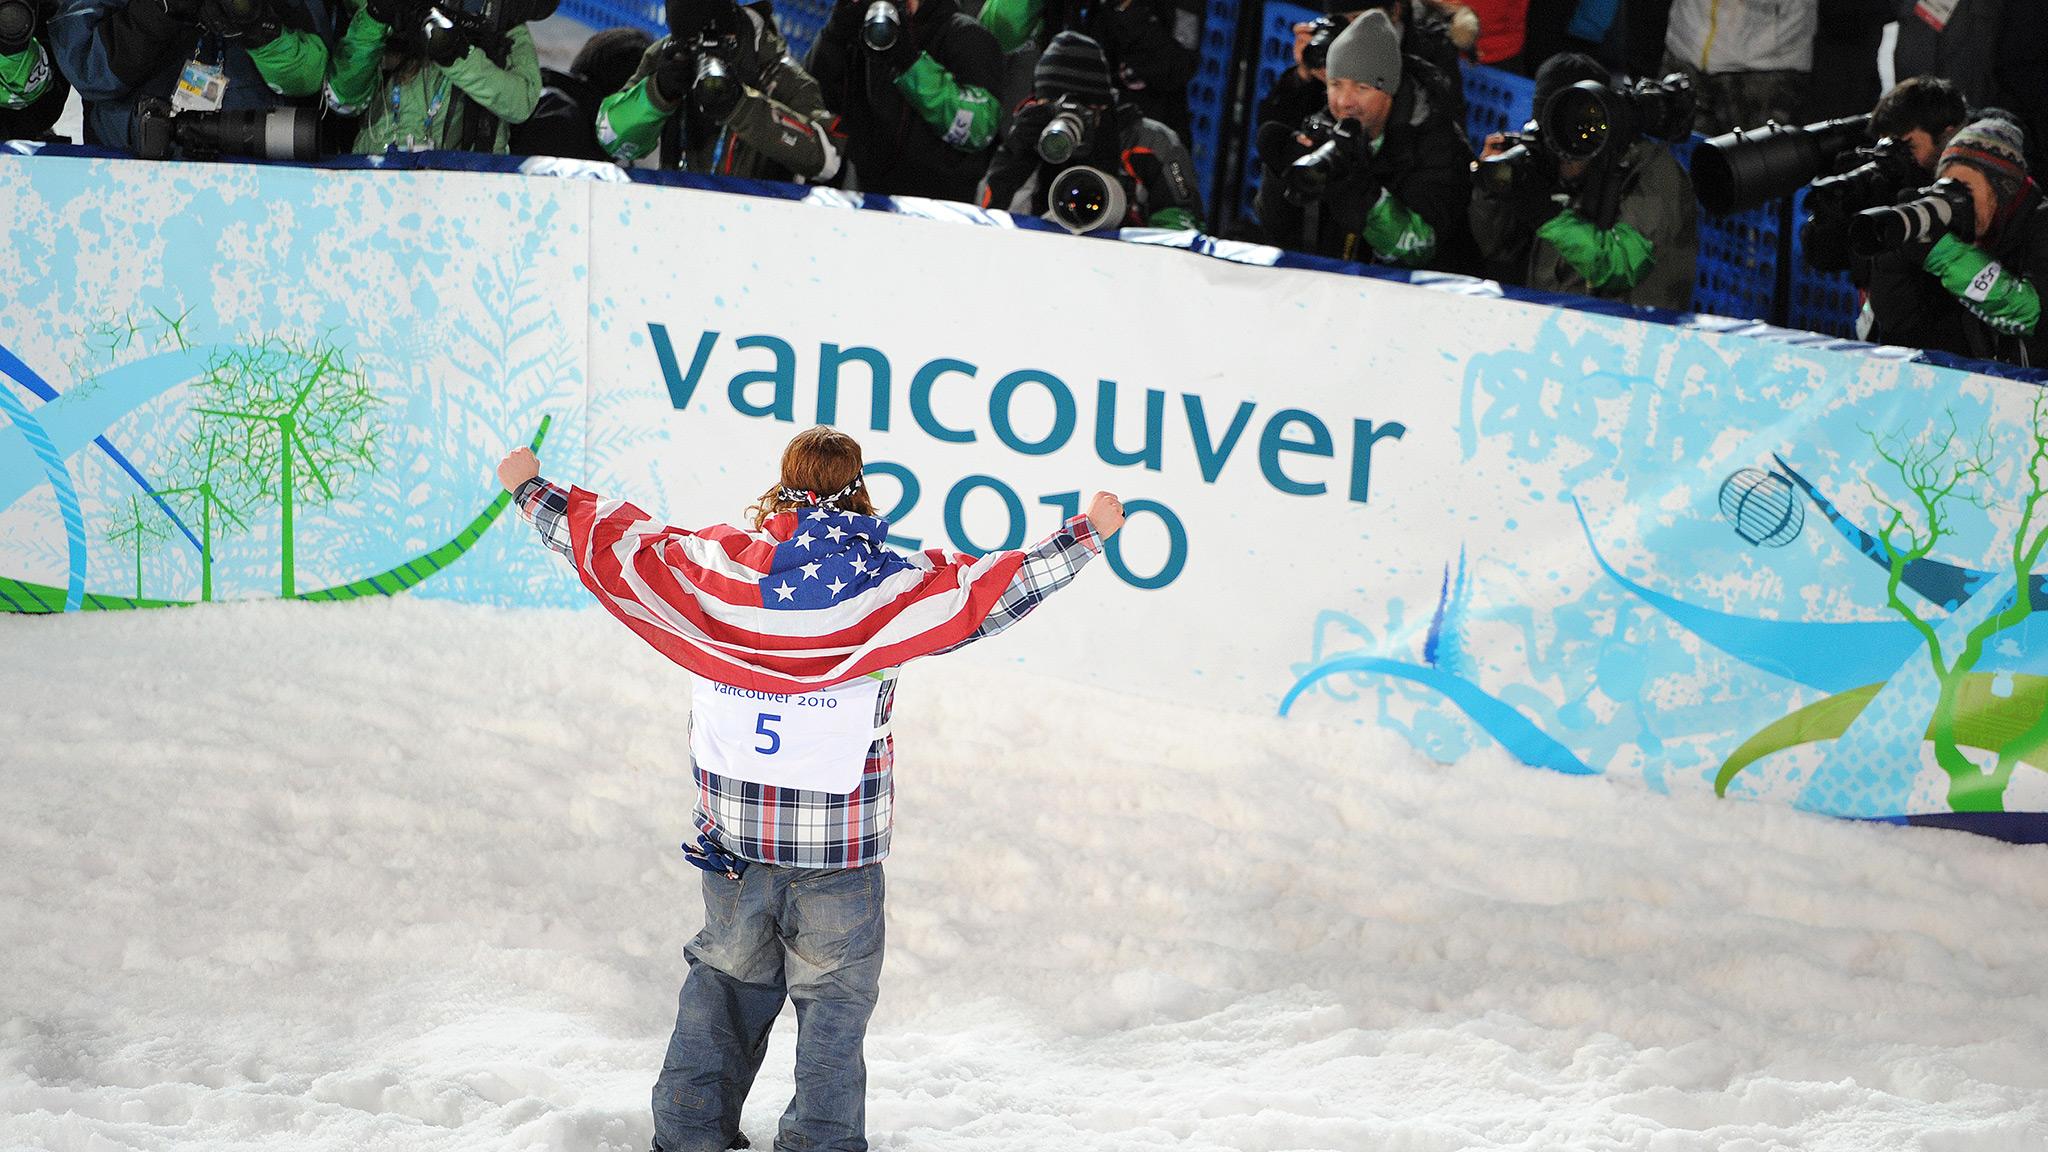 Winter Olympics, 2010